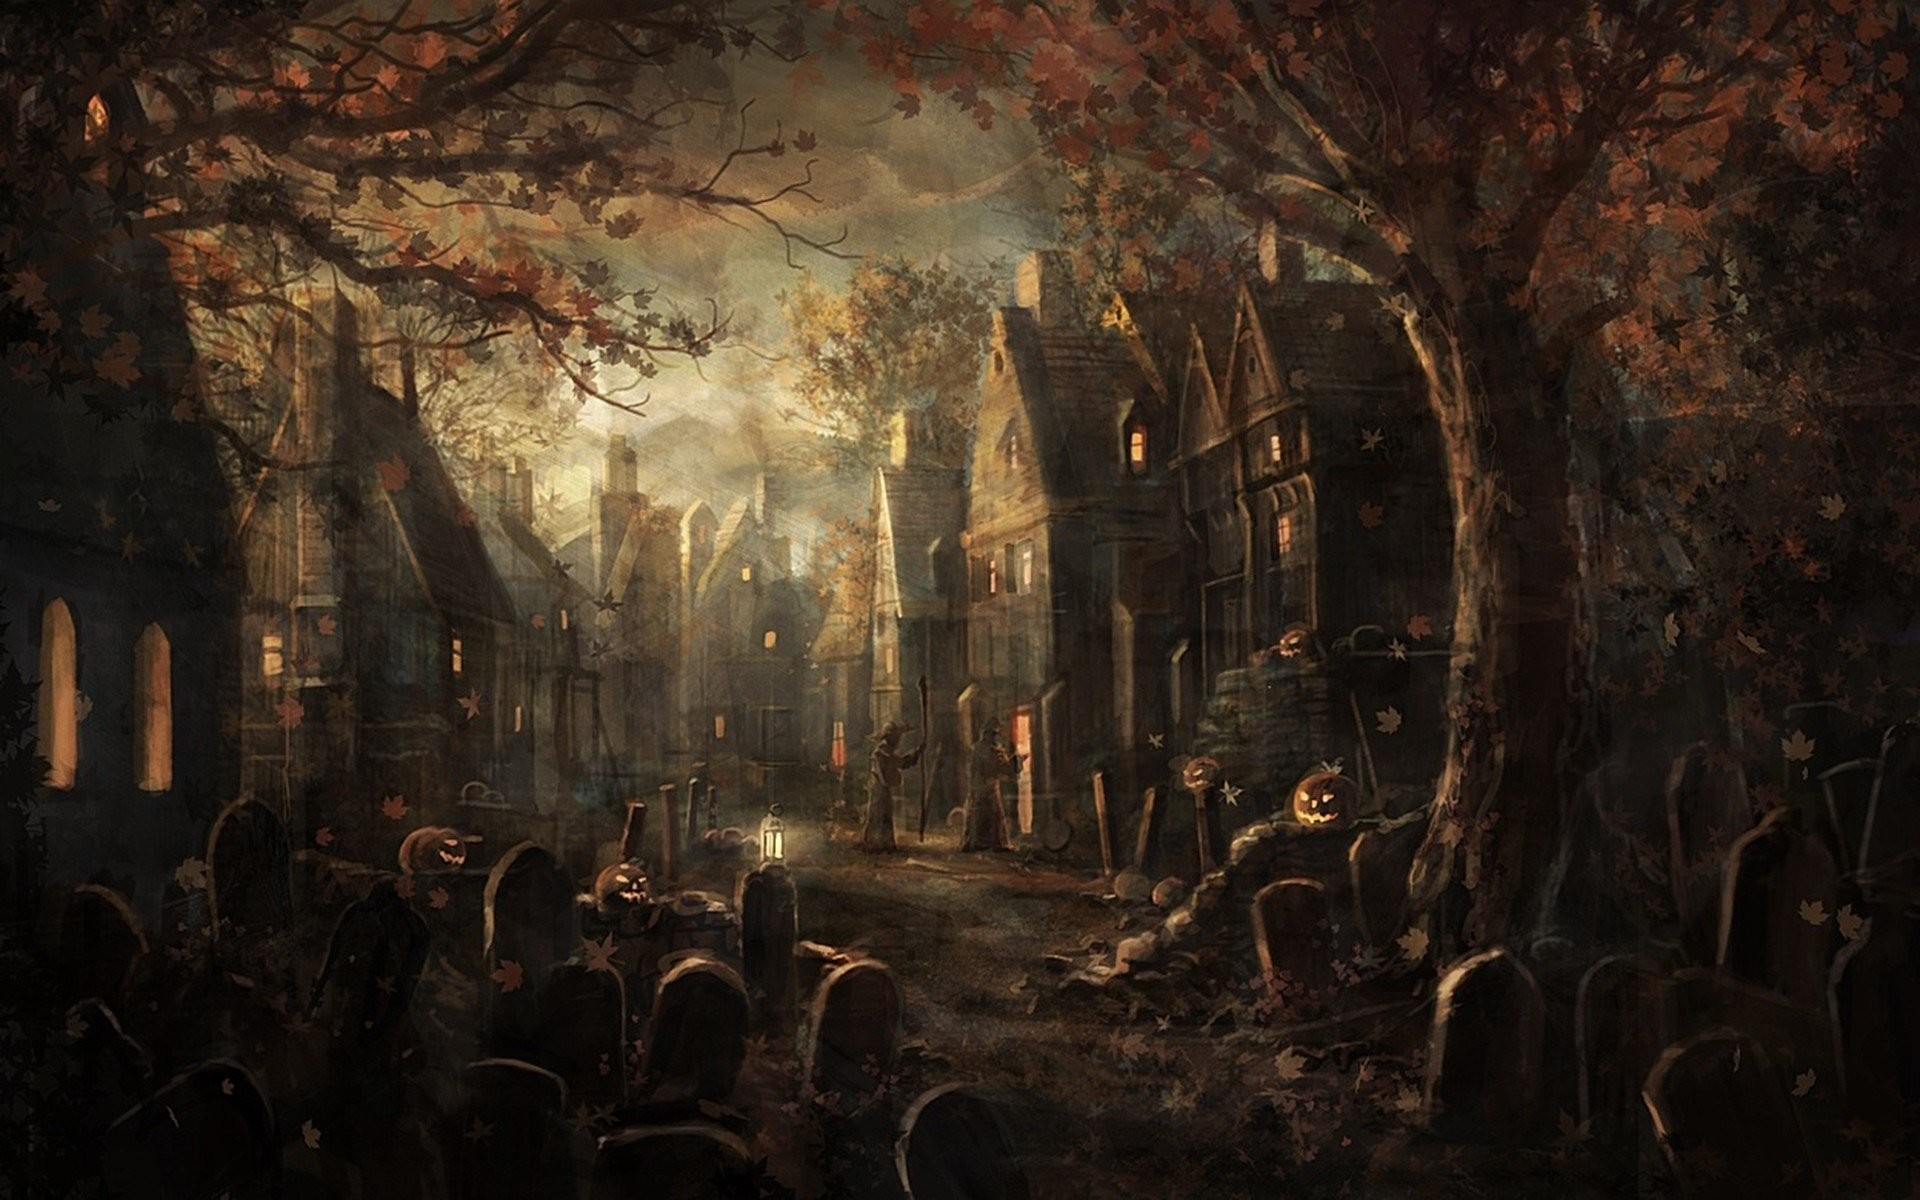 Halloween: Halloween Tombstone - Stock Image I1444734 at ...  Halloween Tombstone Background